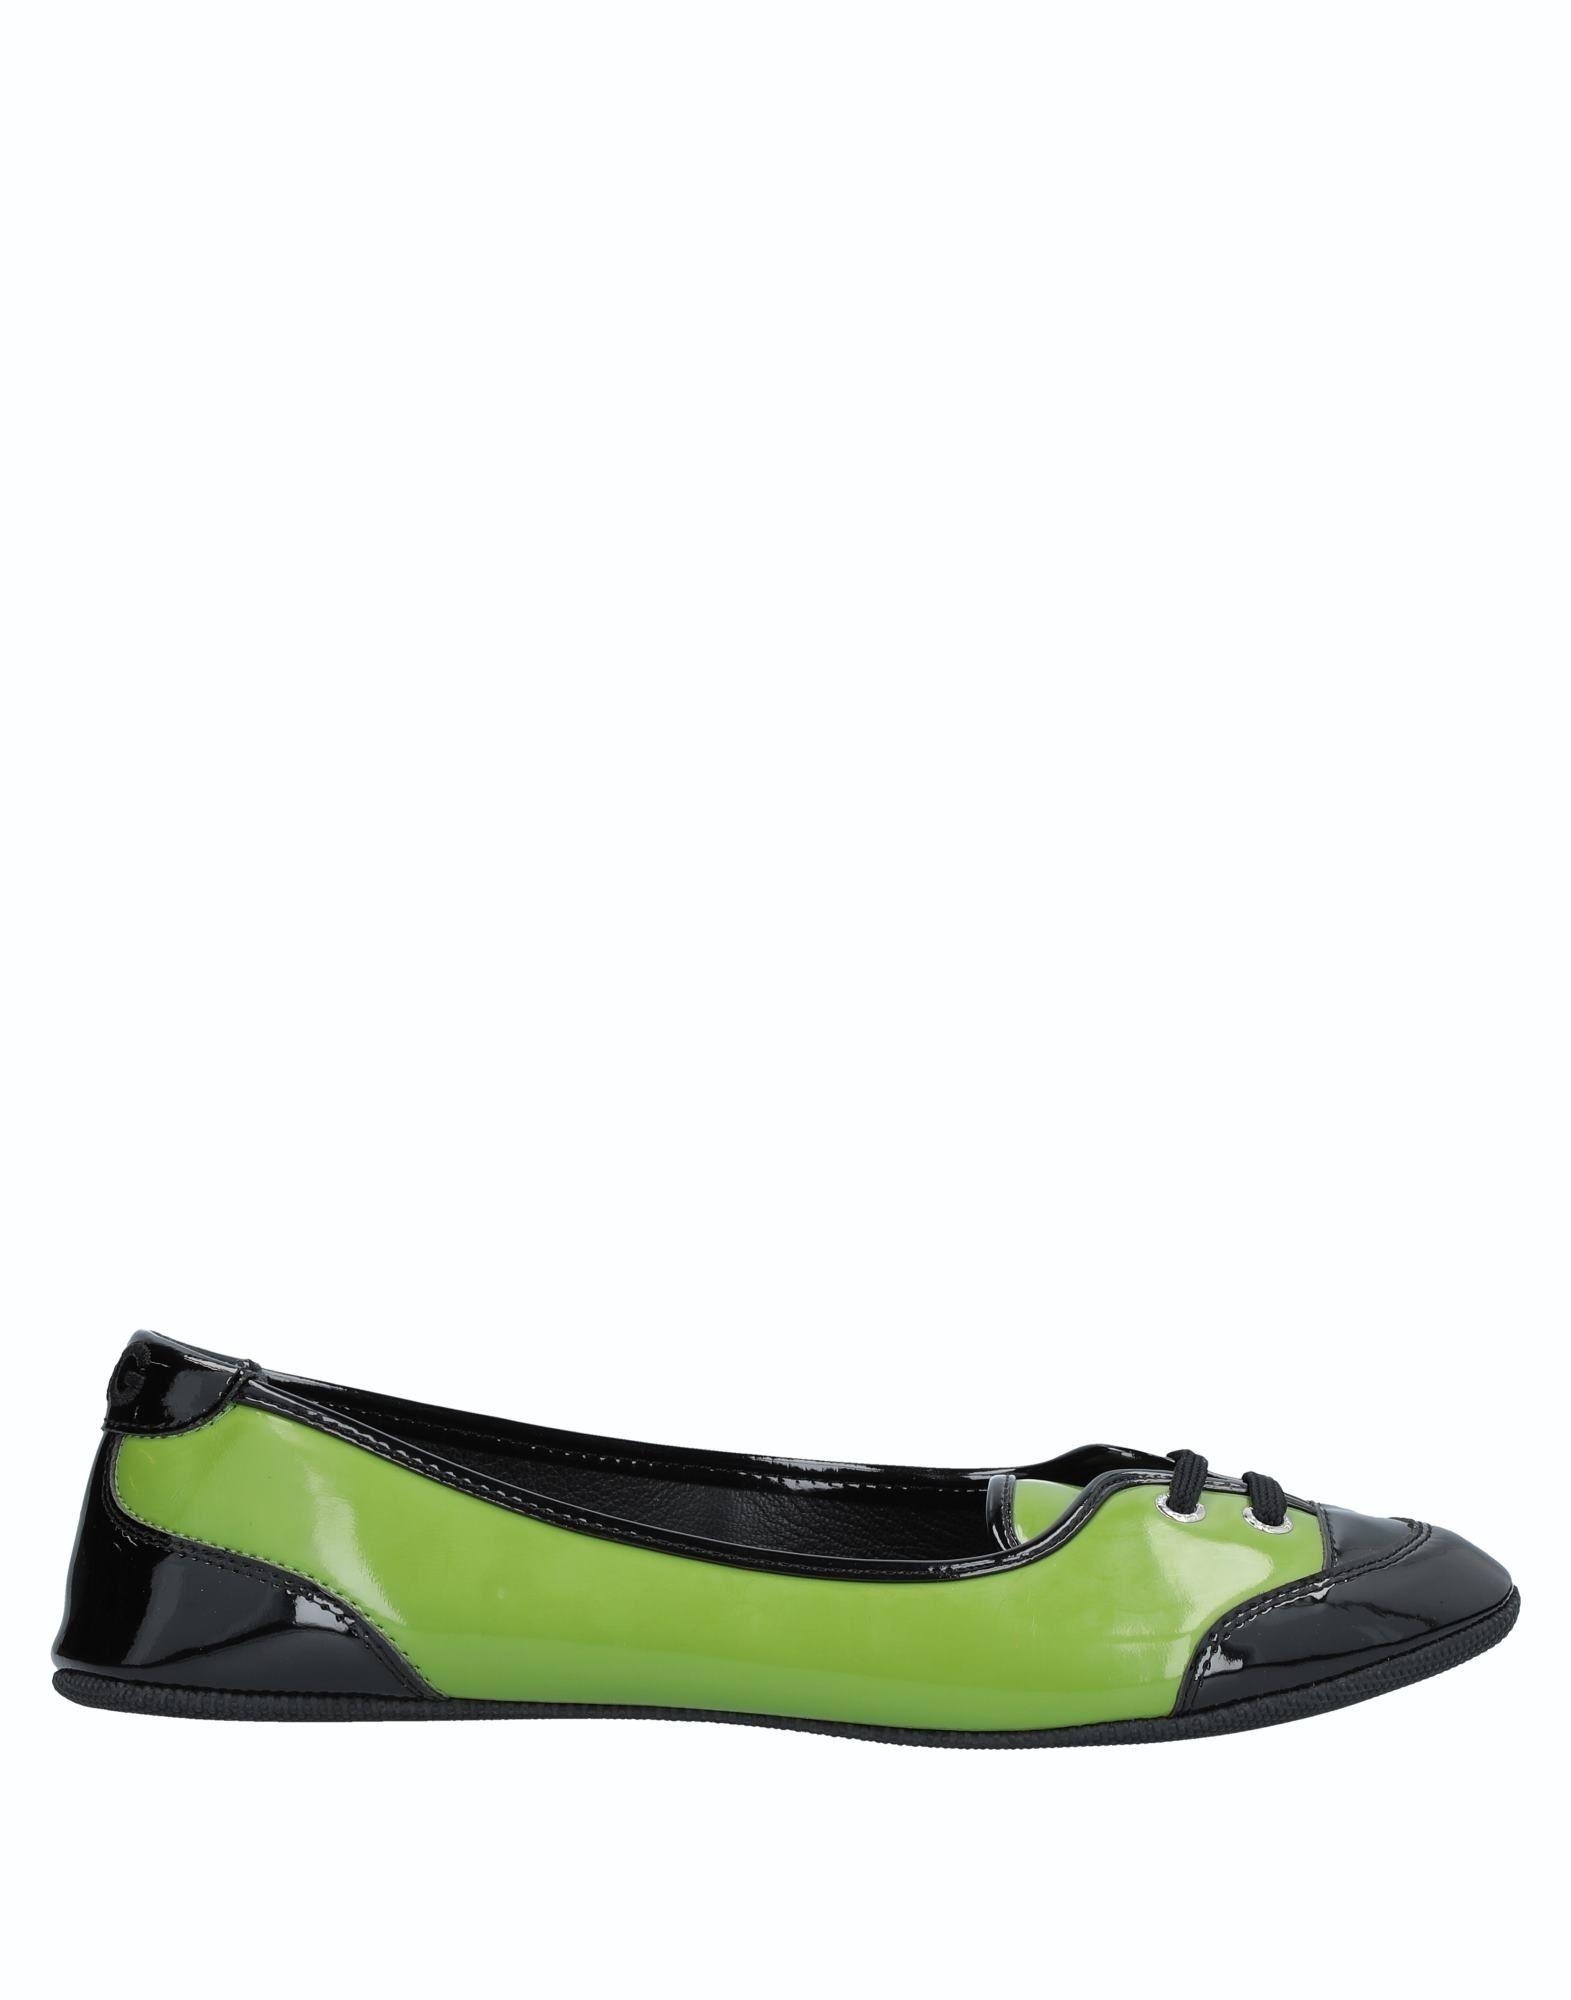 Dolce & Gabbana Ballerinas Damen Schuhe  11537217WPGünstige gut aussehende Schuhe Damen 2ddb5a